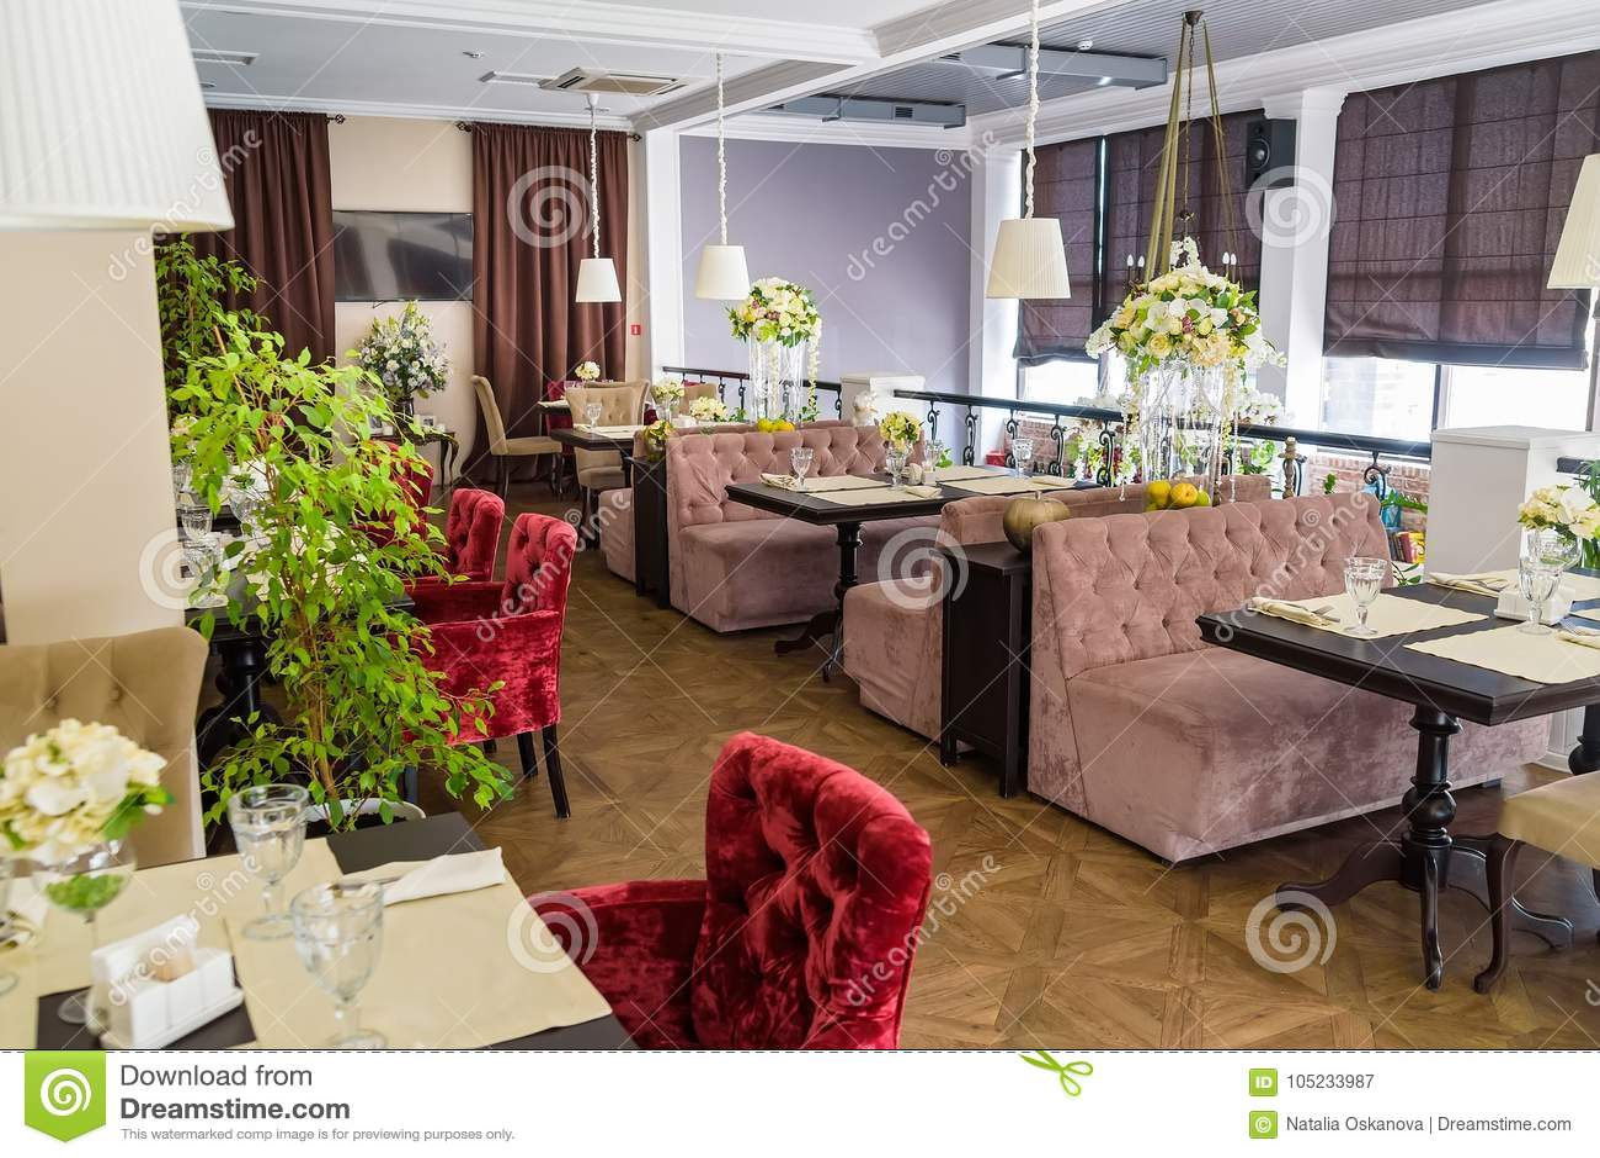 Stylish Interior Of Modern Restaurant Stock Image - Image of hotel ...